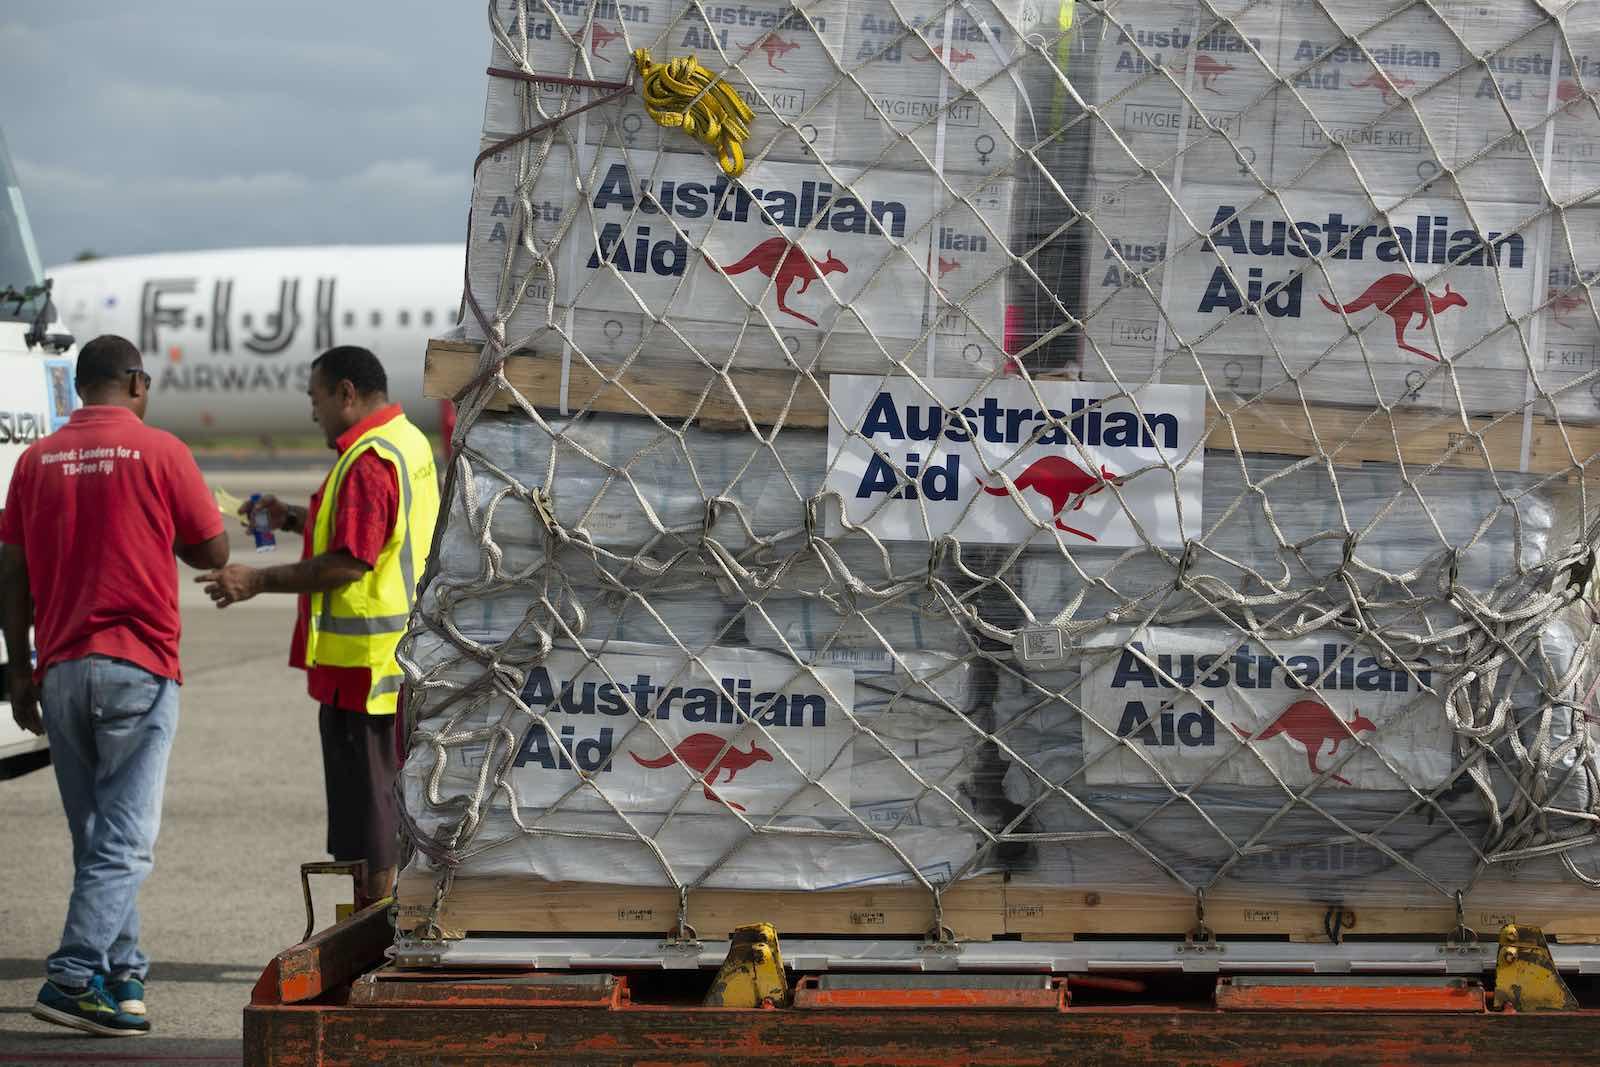 Offloading Australian humanitarian aid stores at Nadi airport, Fiji, in April (Department of Defence)